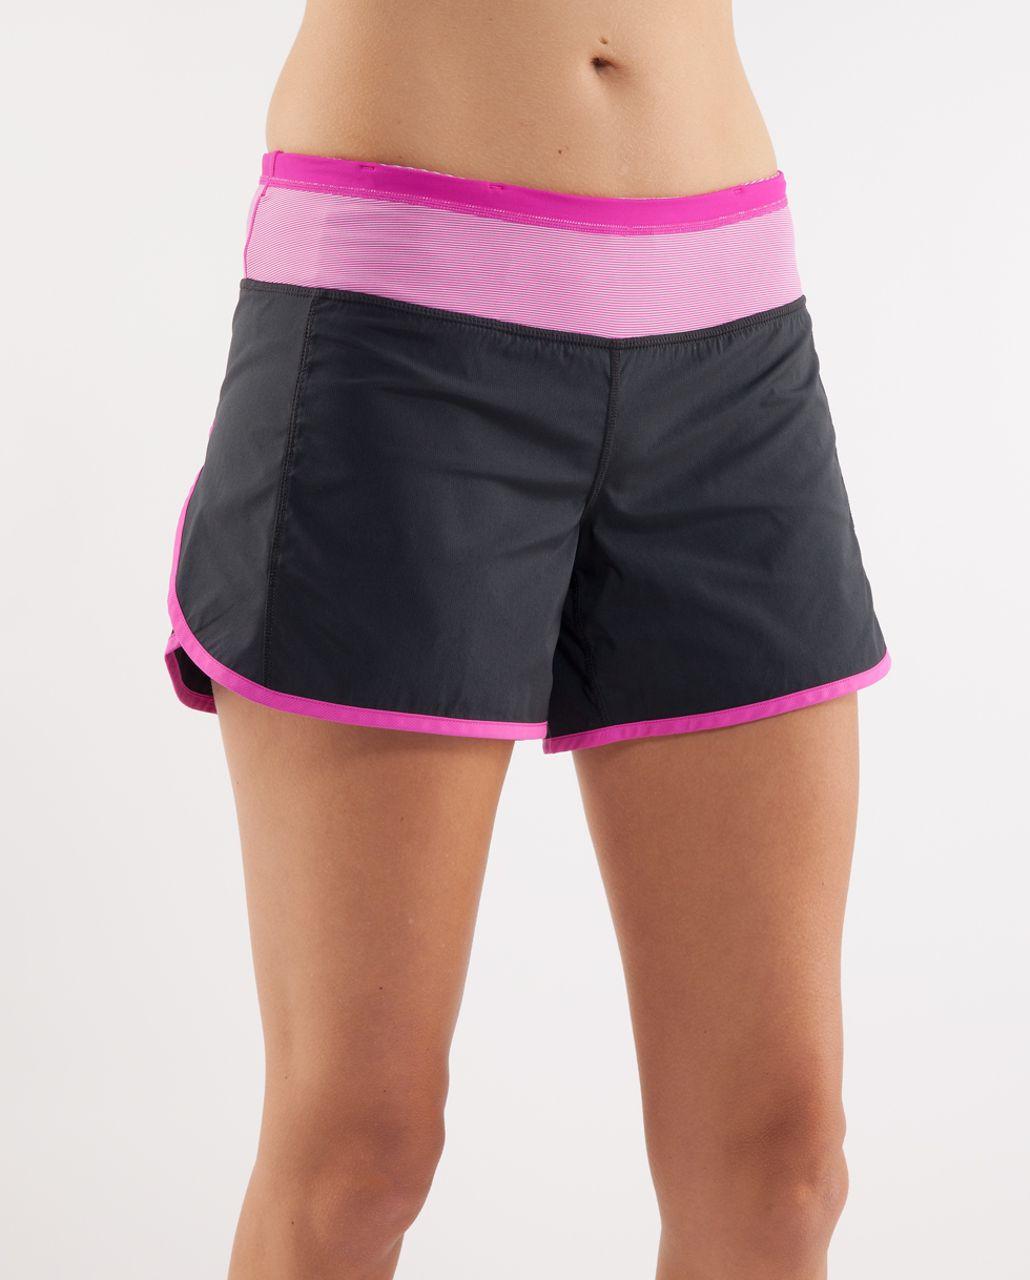 Lululemon Turbo Run Short - Black /  White Paris Pink Microstripe